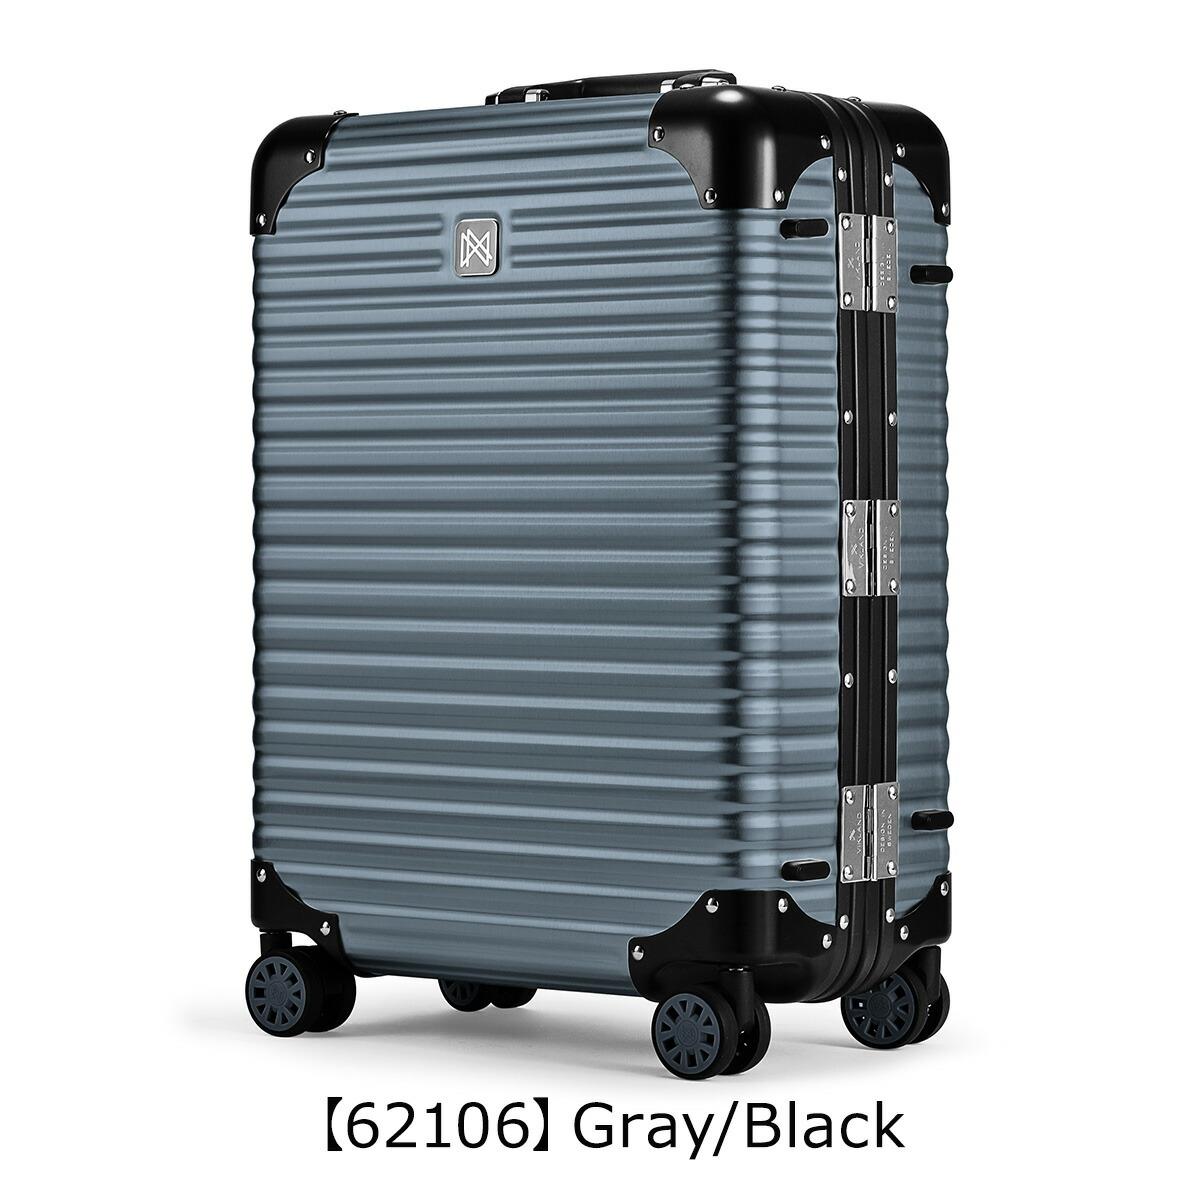 【62106】Gray/Black